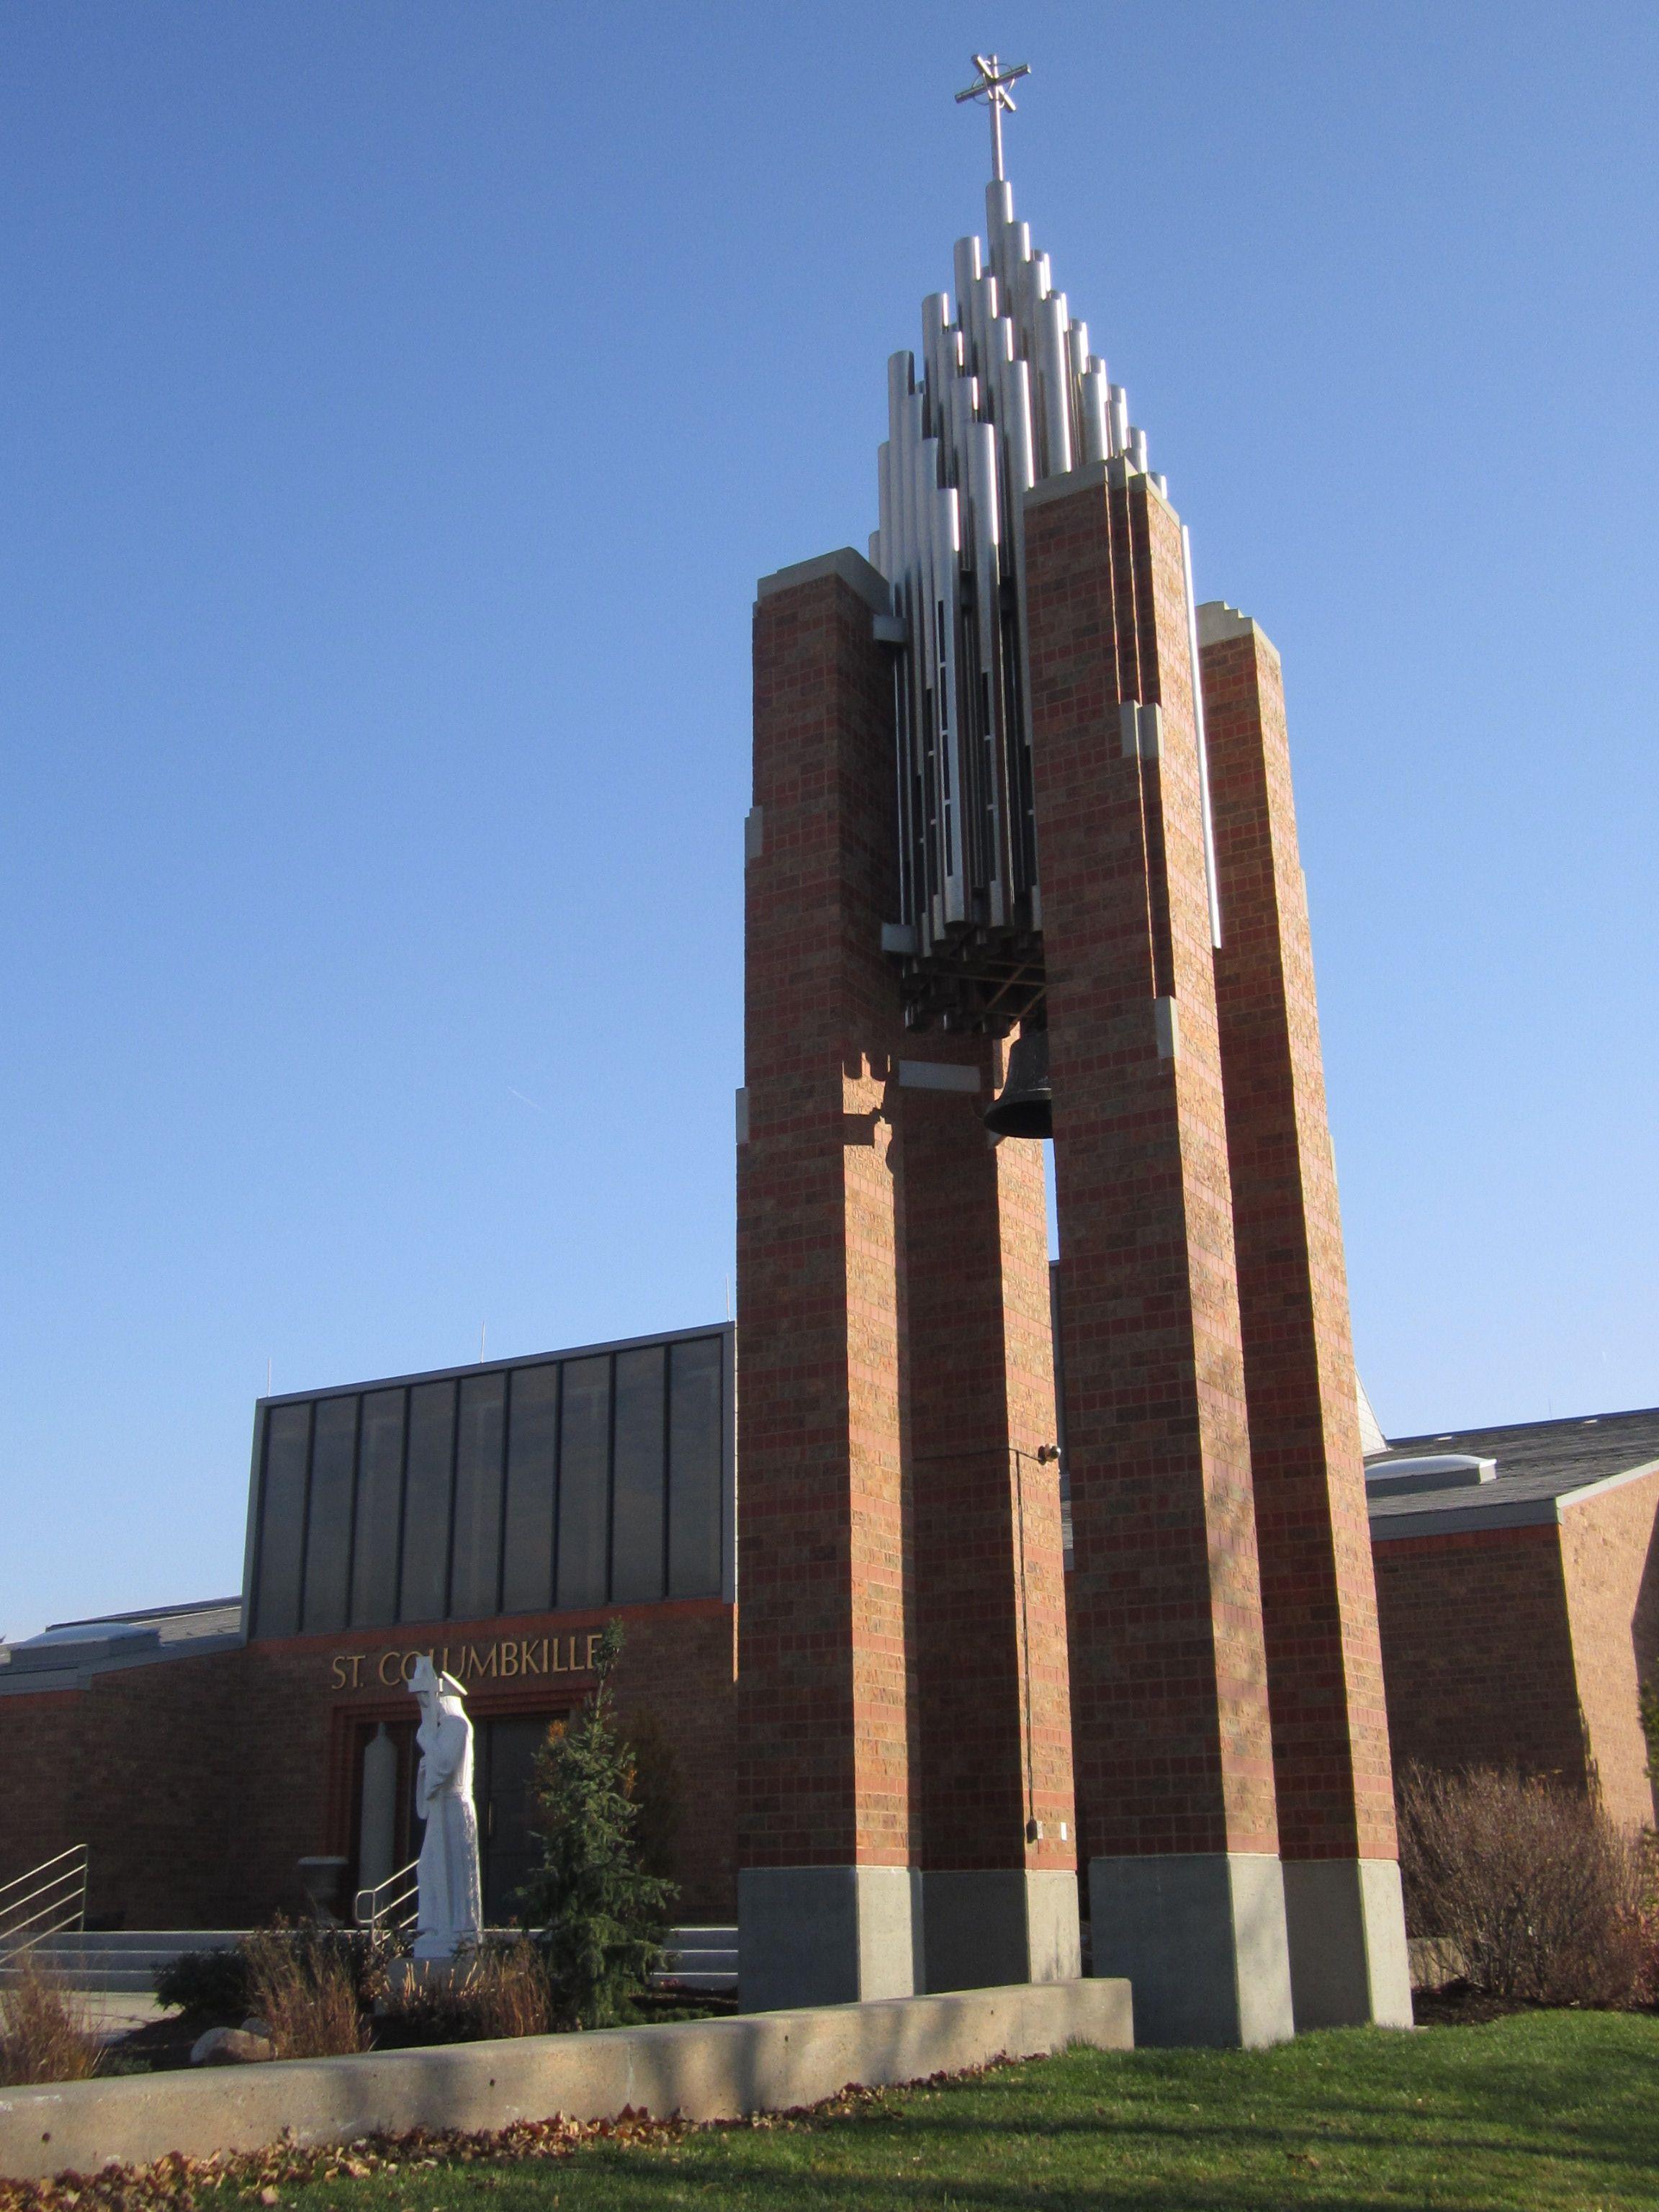 St. Columbkille Catholic Church in Papillion, Nebraska